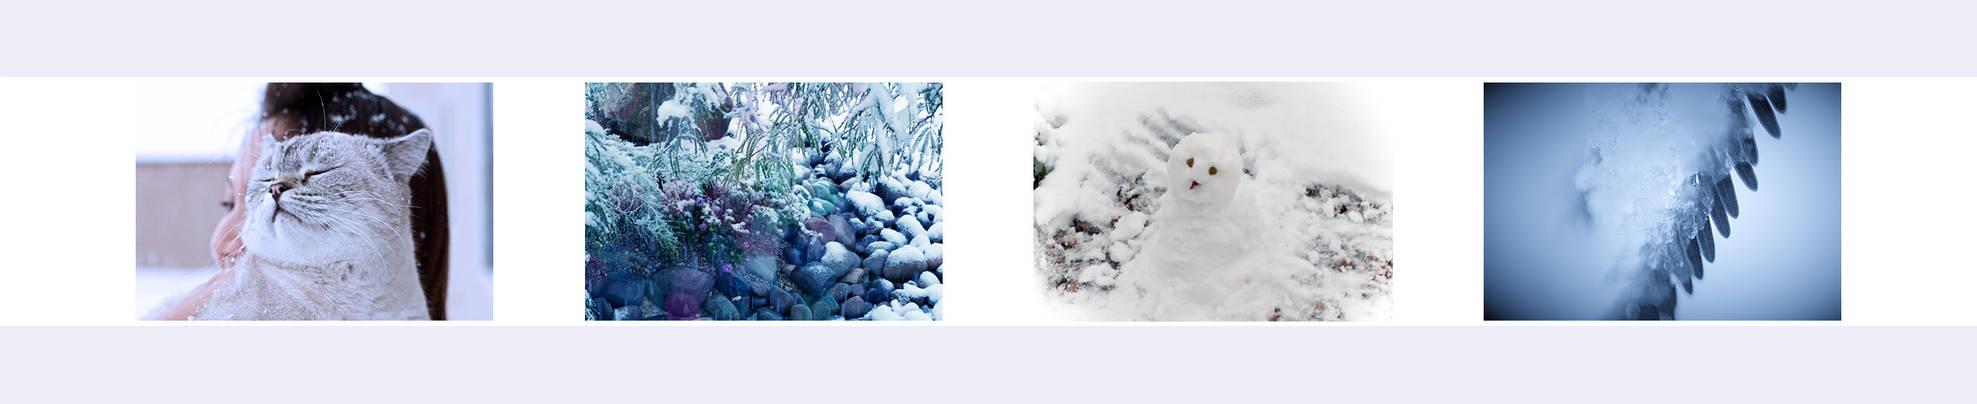 Merry Snow Day